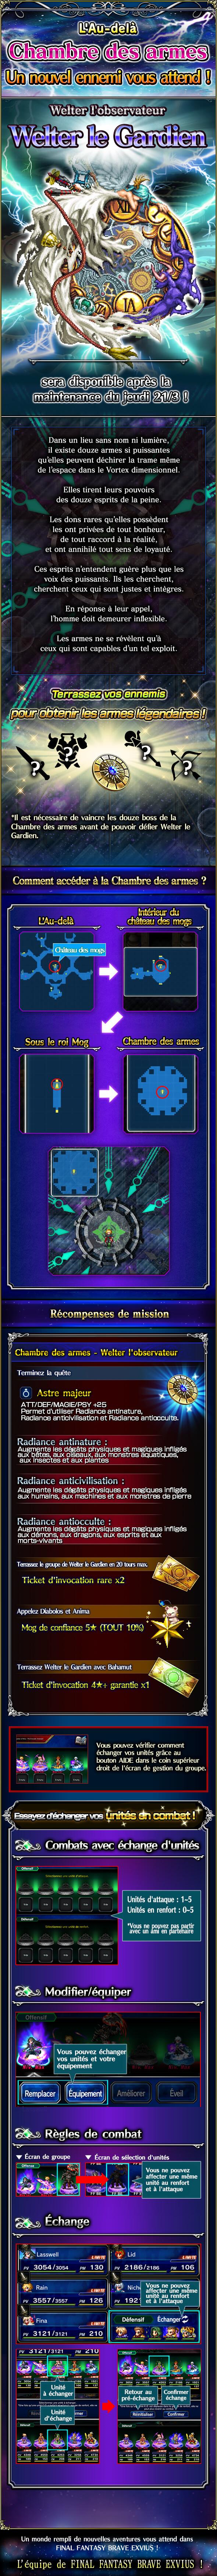 Chambre des armes - Welter le Gardien (Warden Welter) ! A partir du 21/03/19 ChamberOfArmsWardenWelter